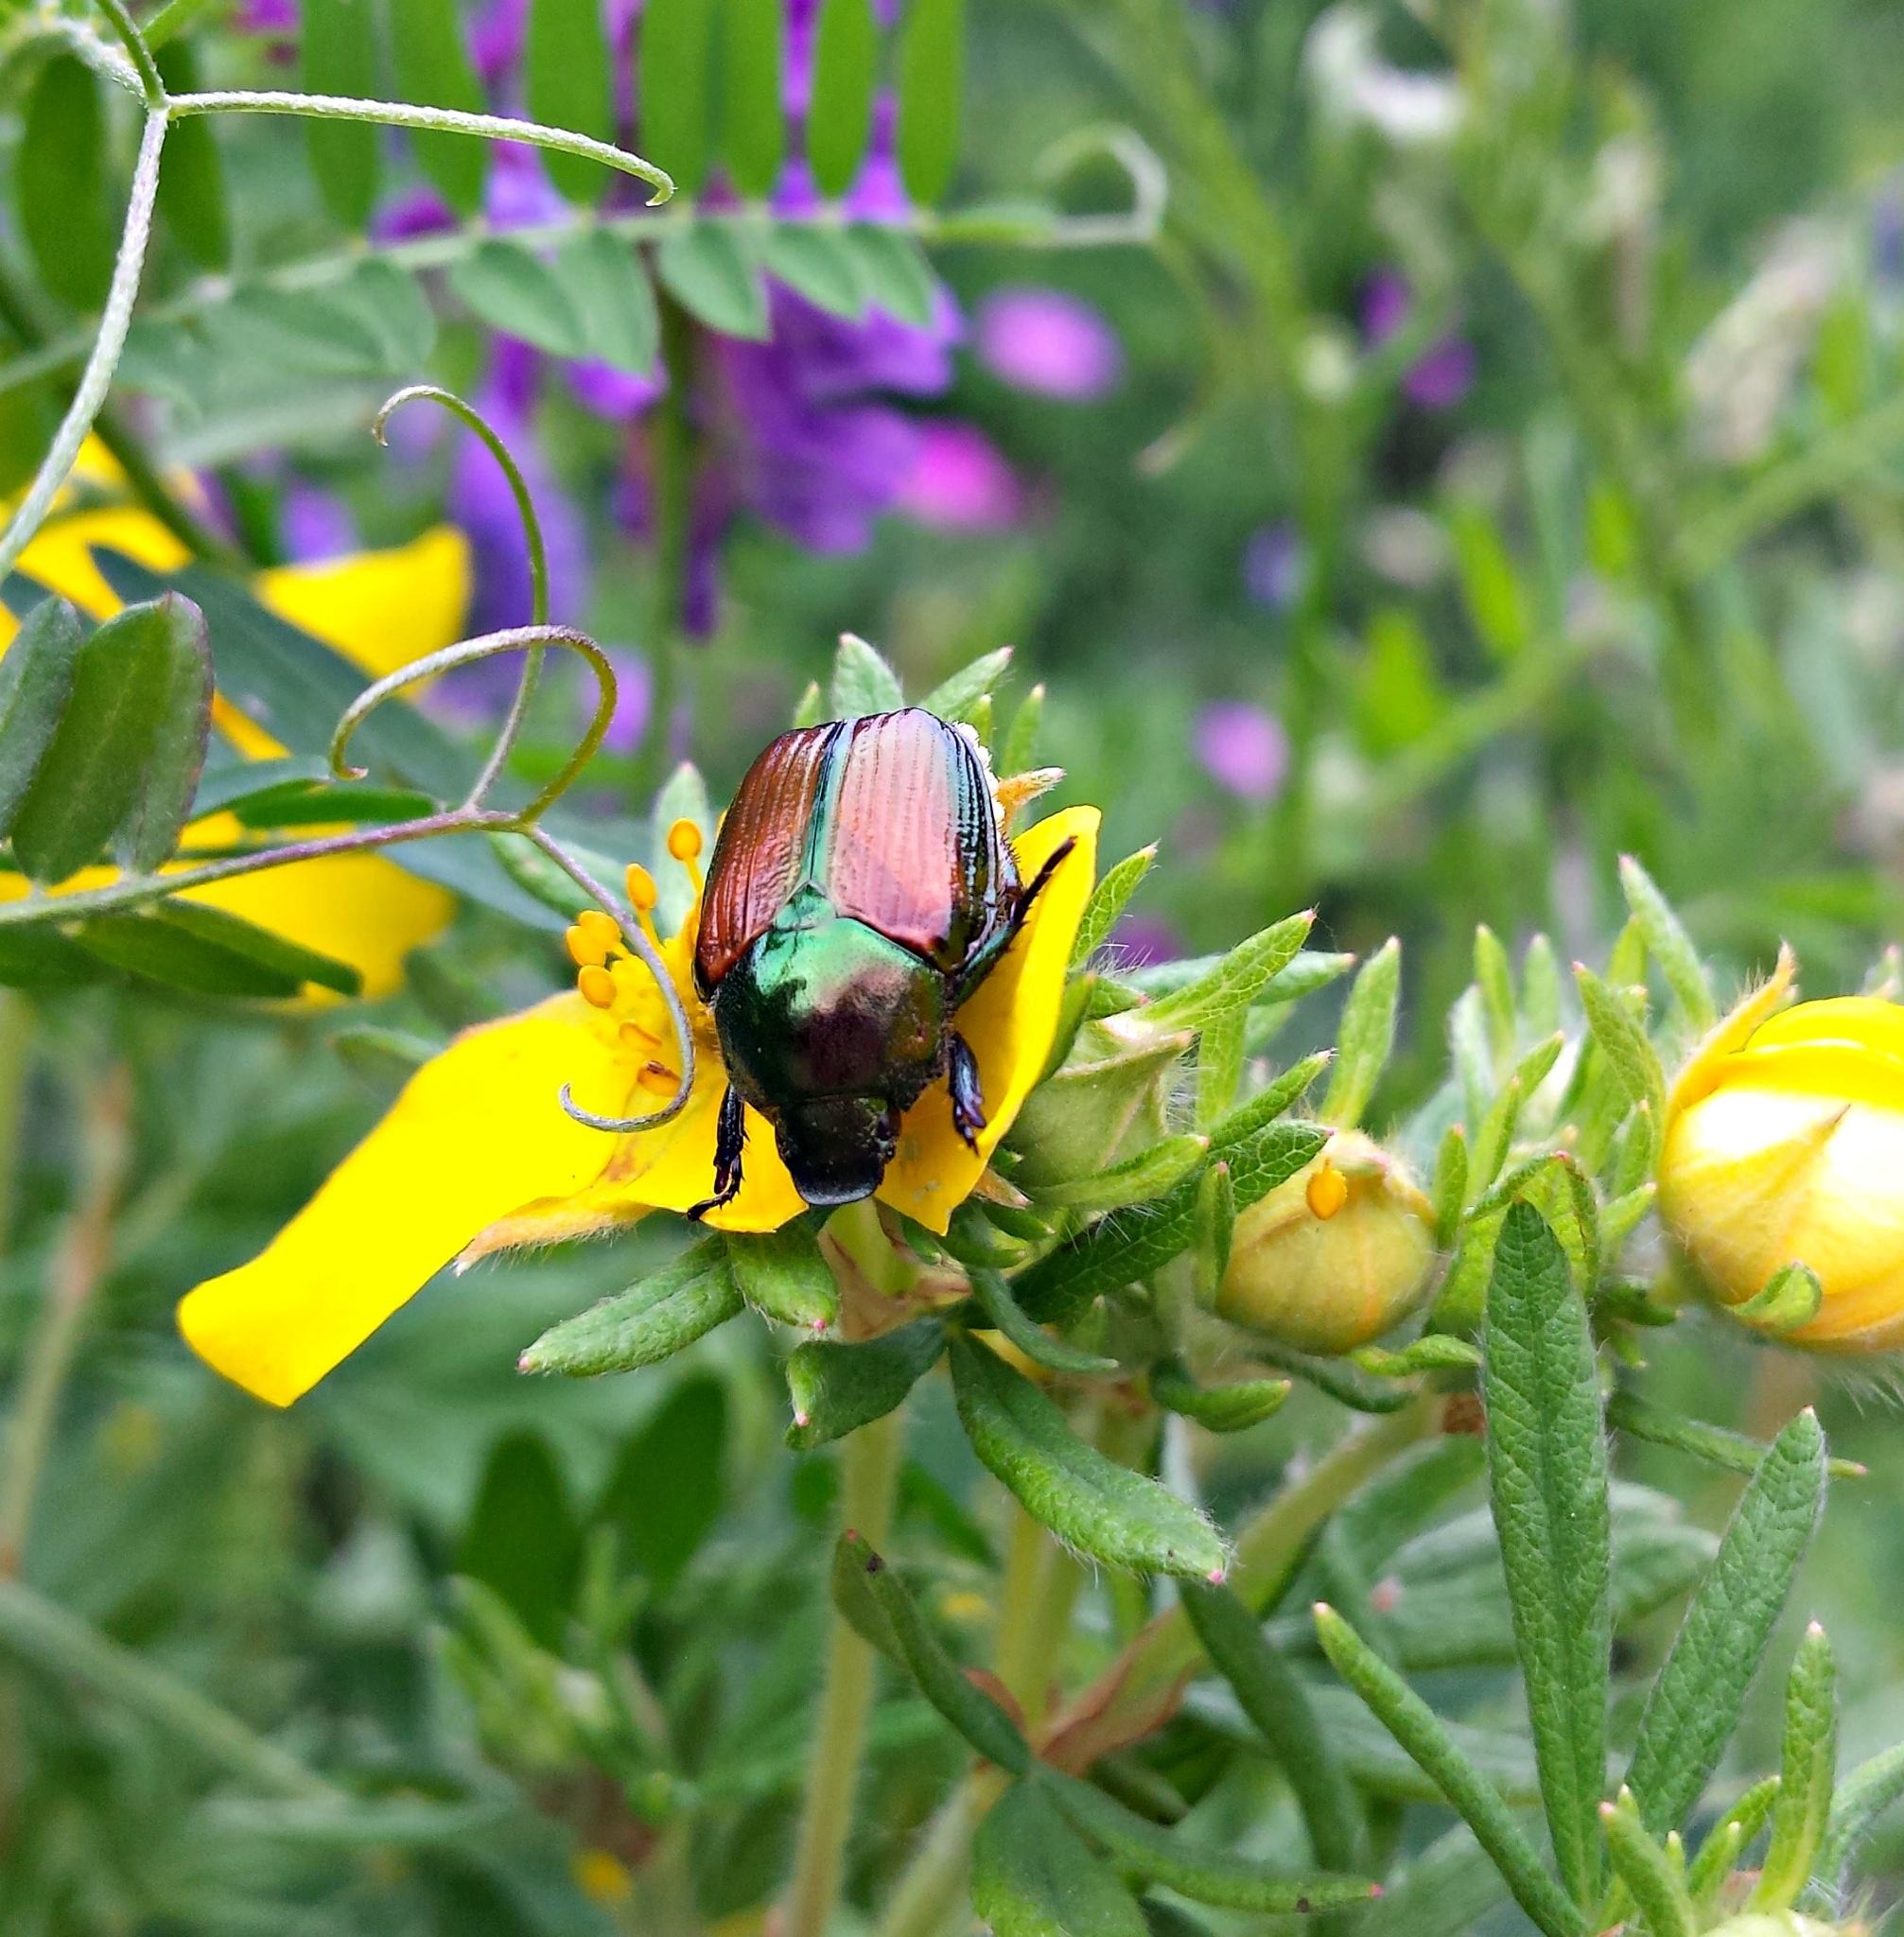 Beetle by Janice Bradford